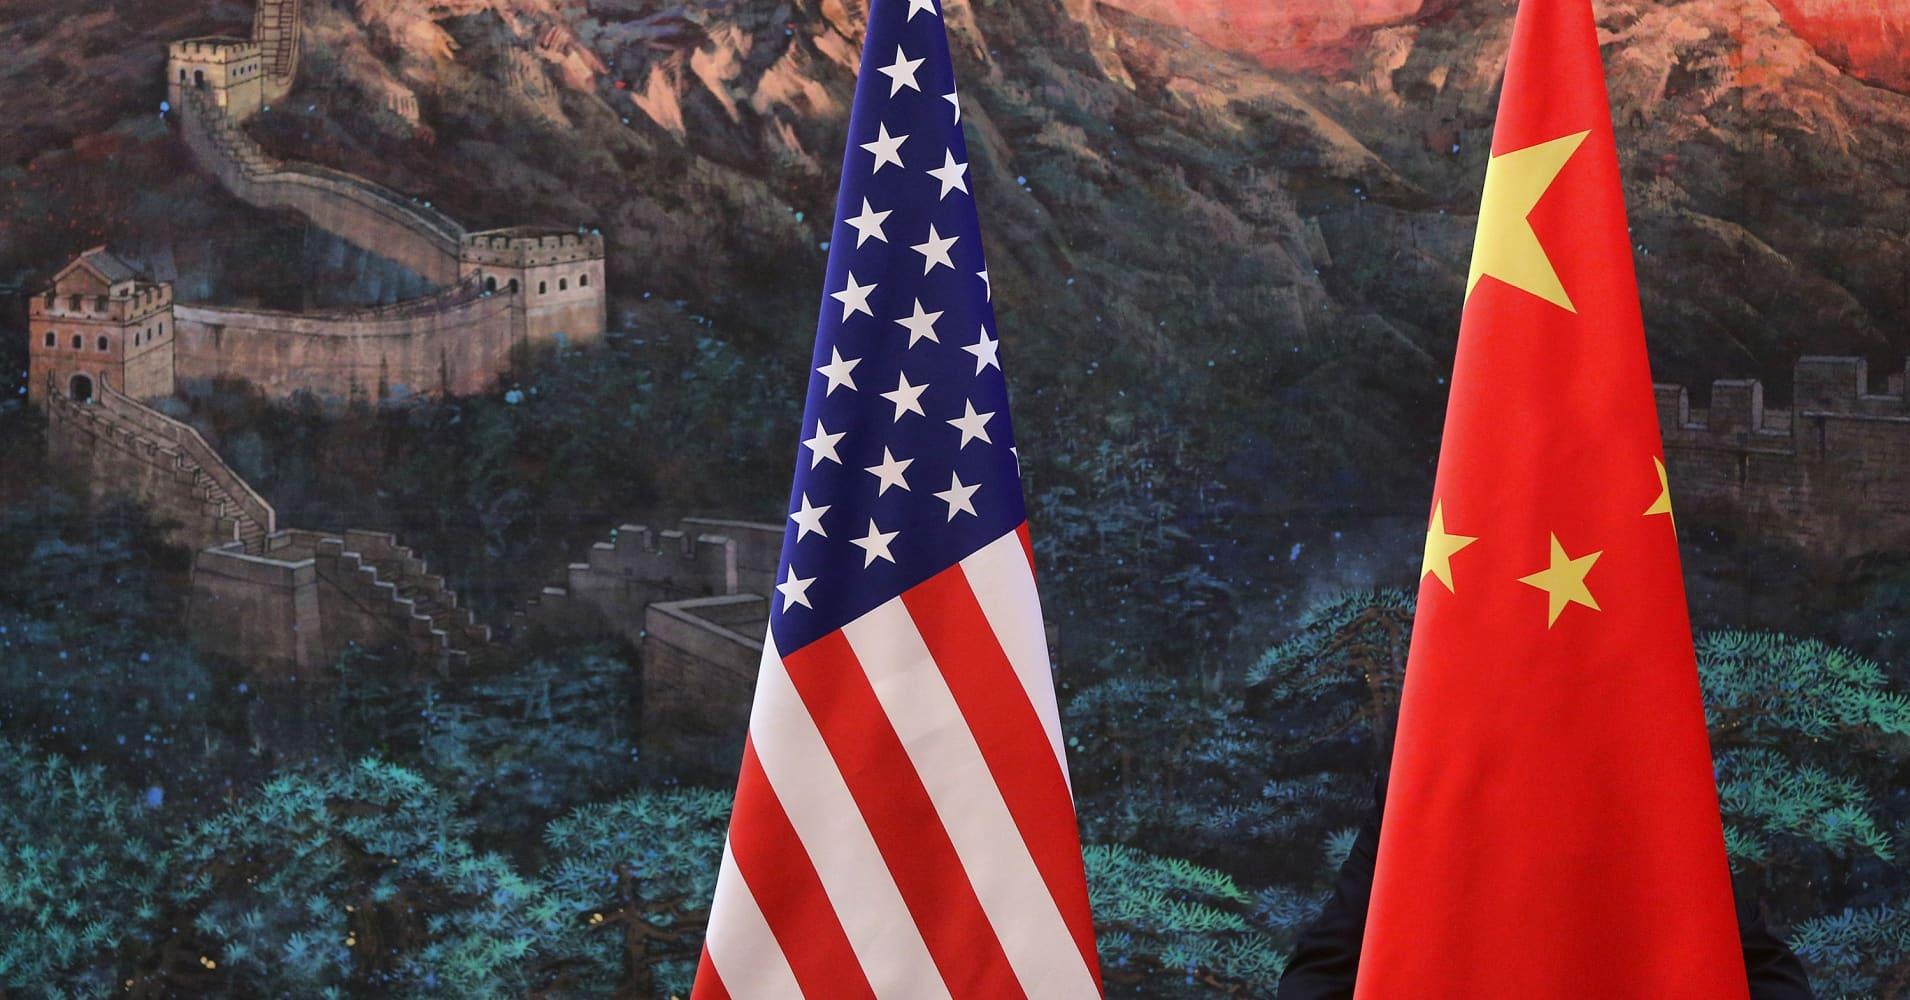 China trade delegation arrives in Washington for talks